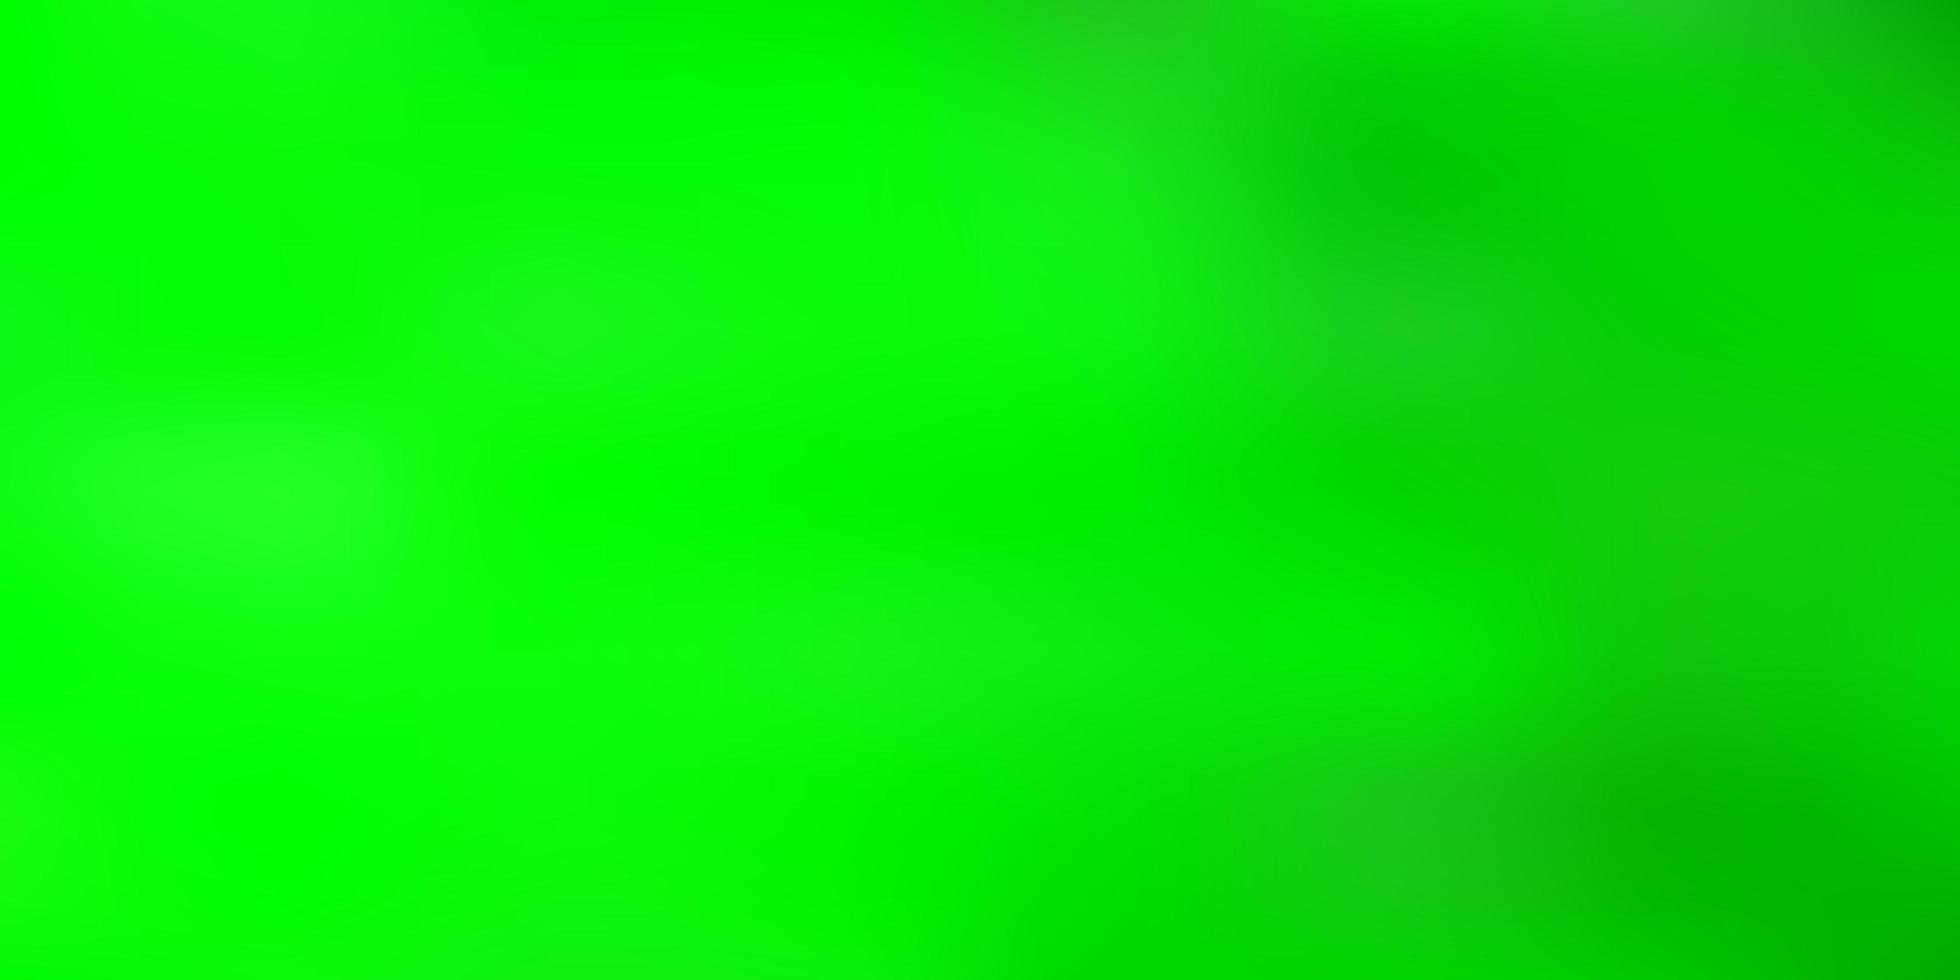 Light green vector gradient blur background.